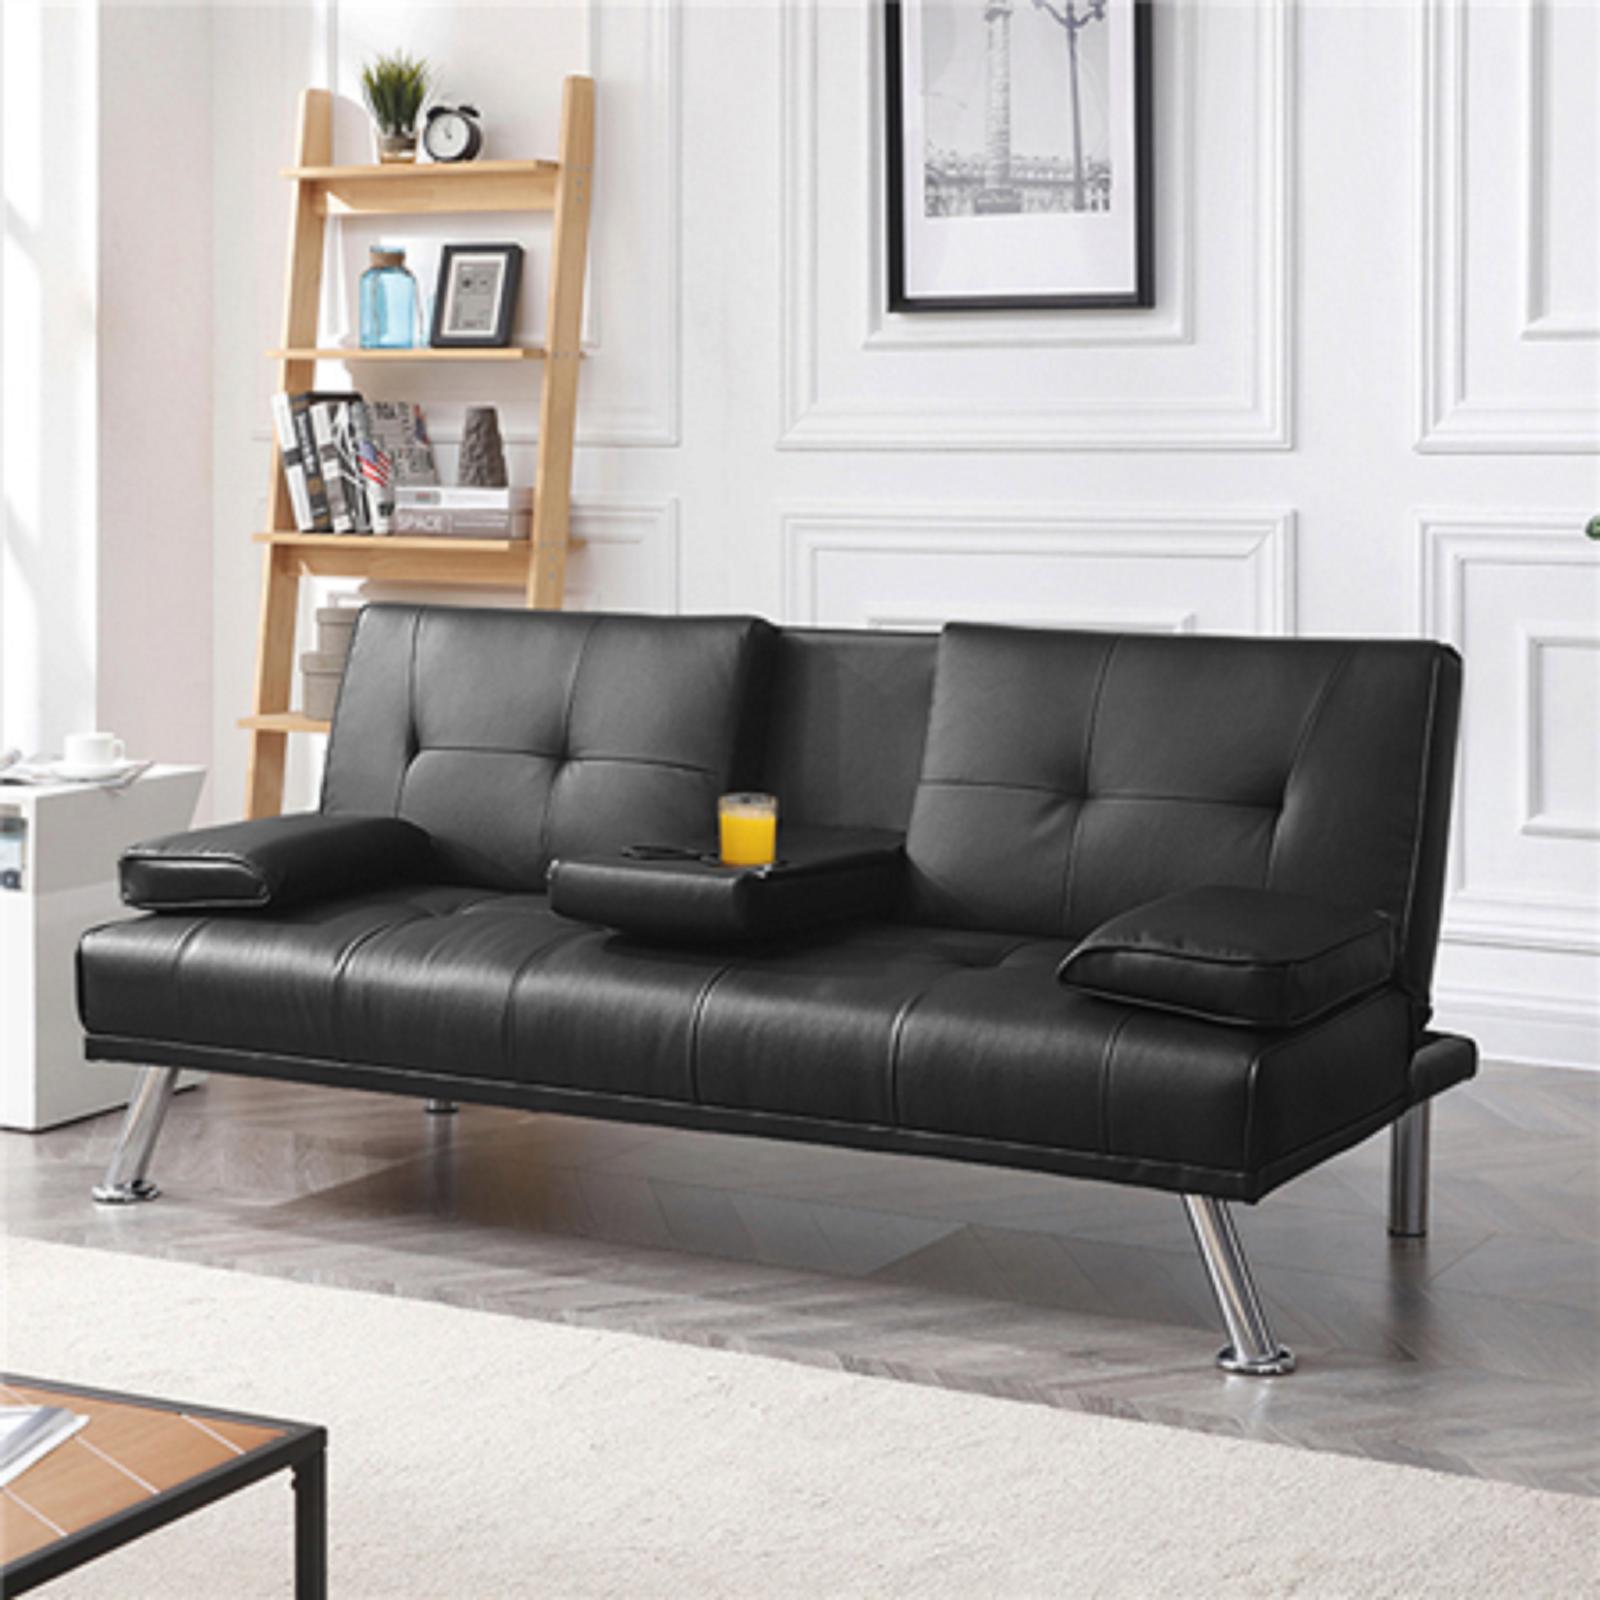 Pu Leather Sofa Bed Futon Home Living